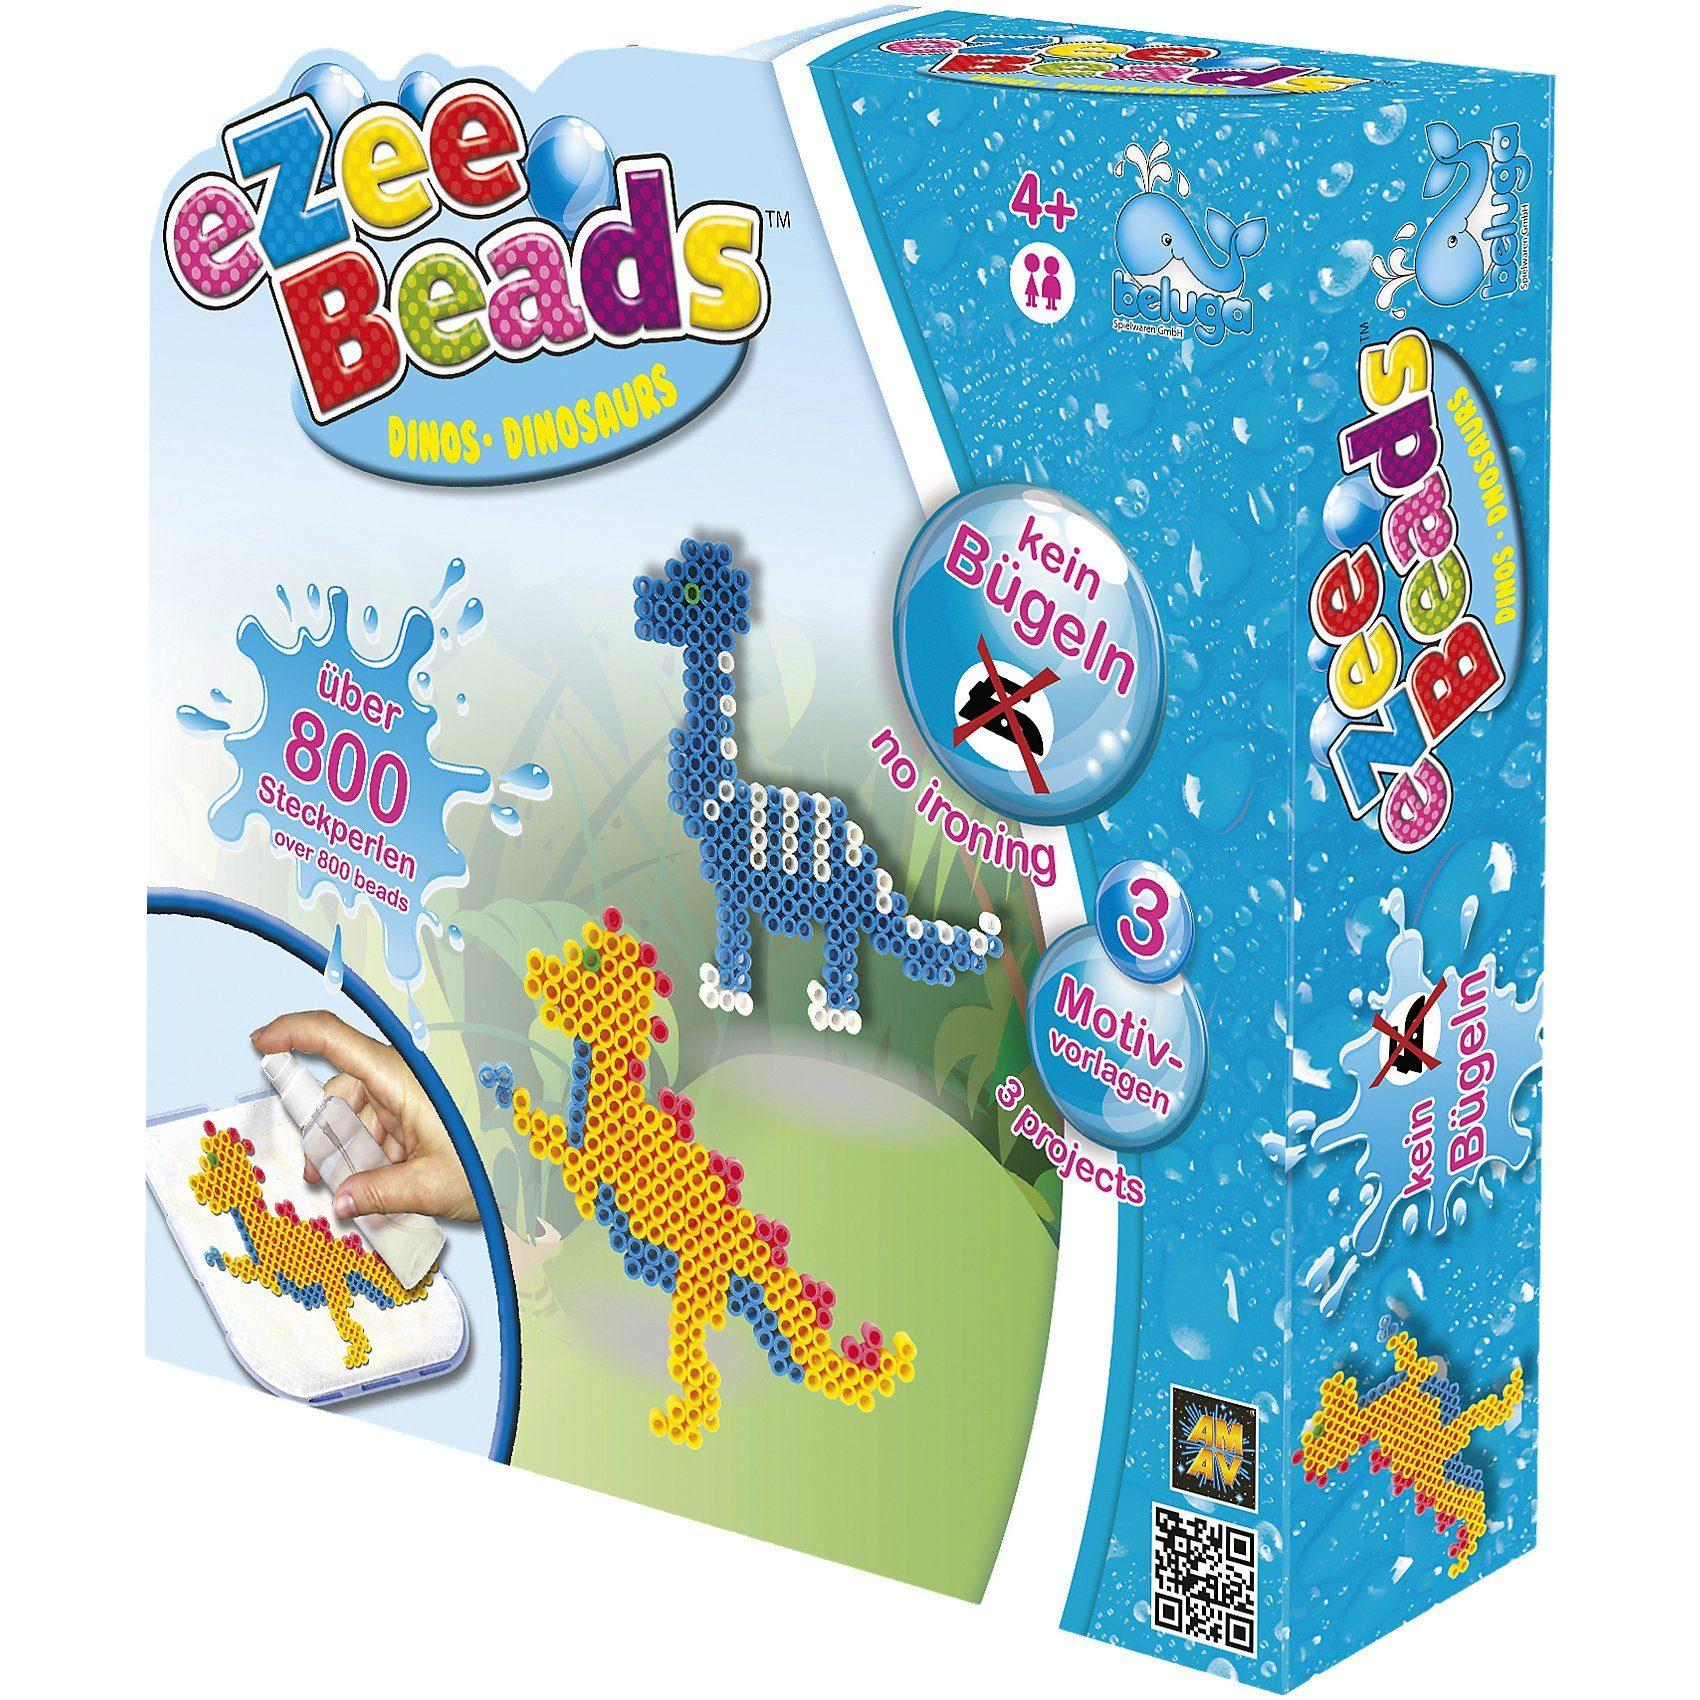 Beluga eZee Beads Sprühperlen Dinos, ca. 800 Perlen